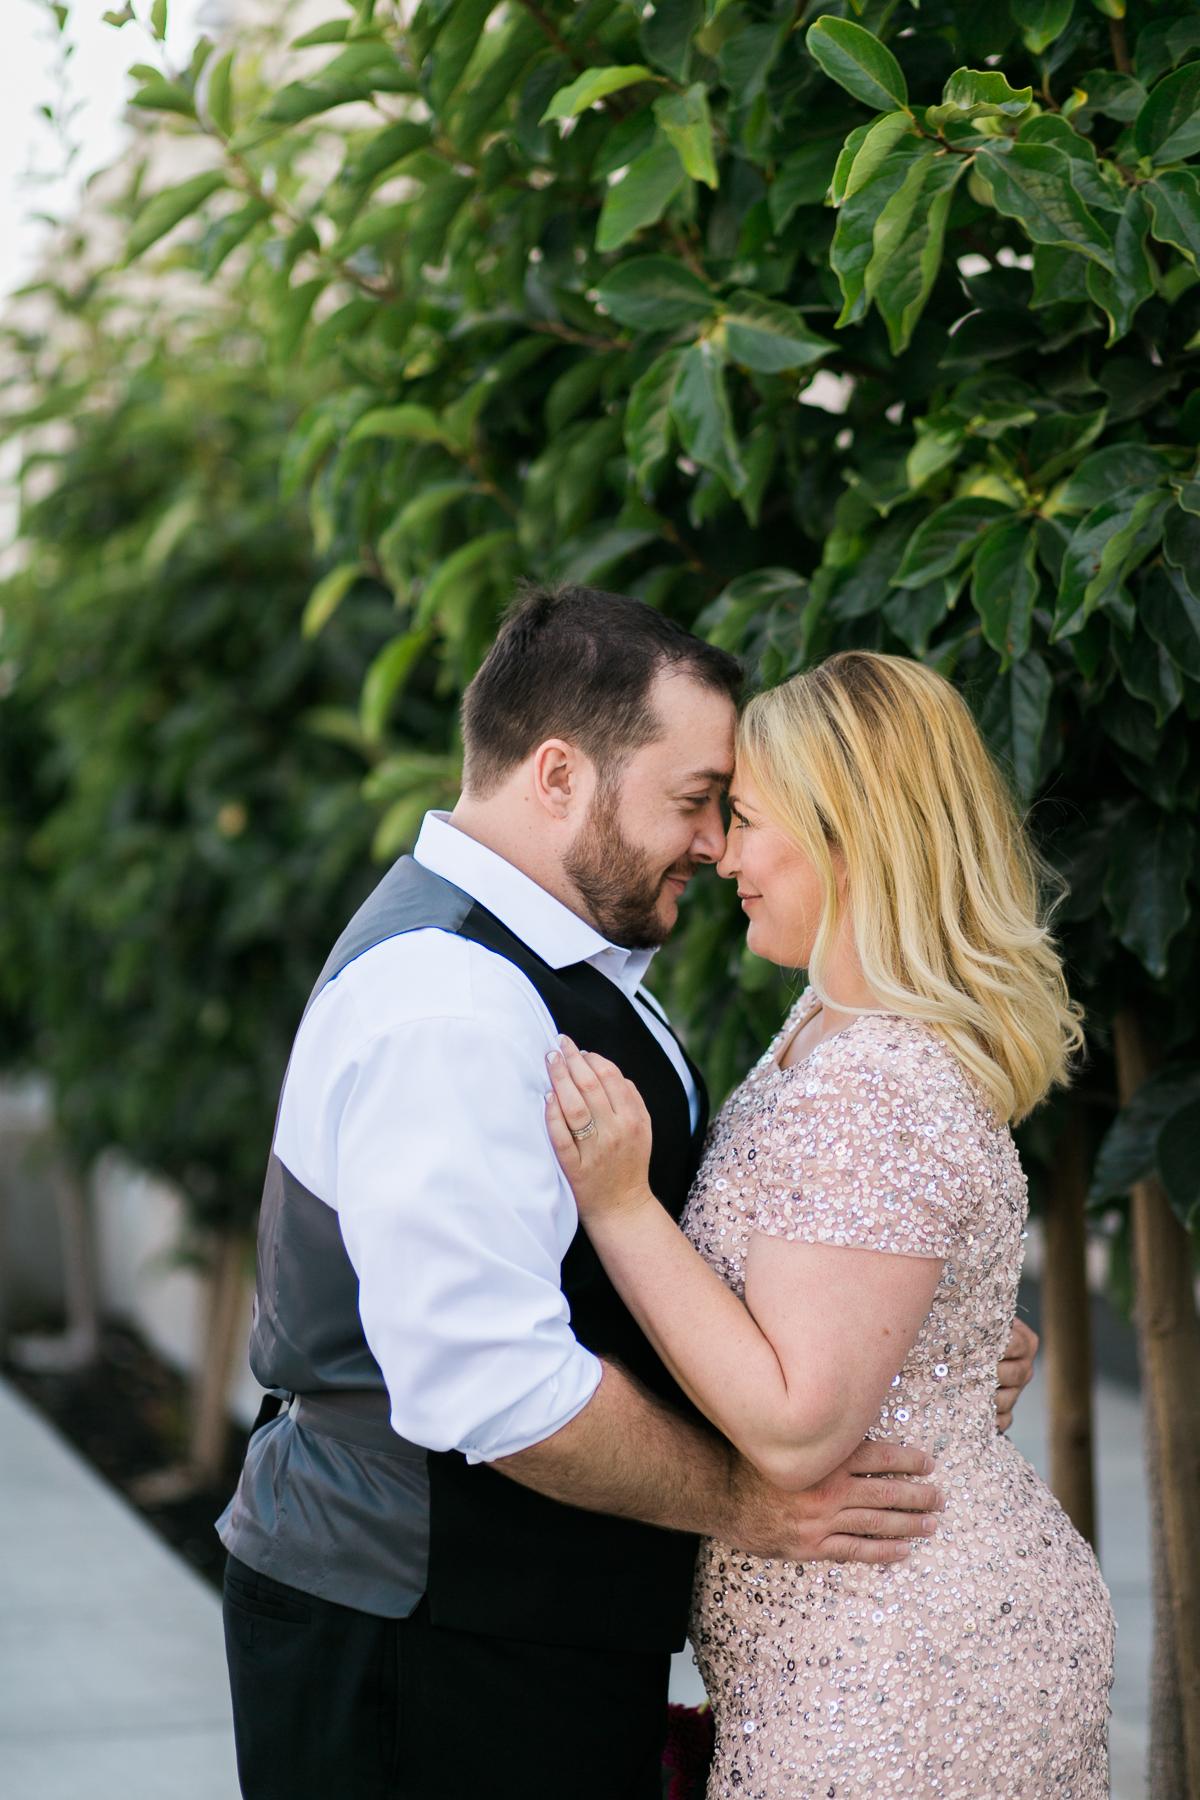 Sebastopol Barlow Wedding Photography Maria Villano-14.jpg